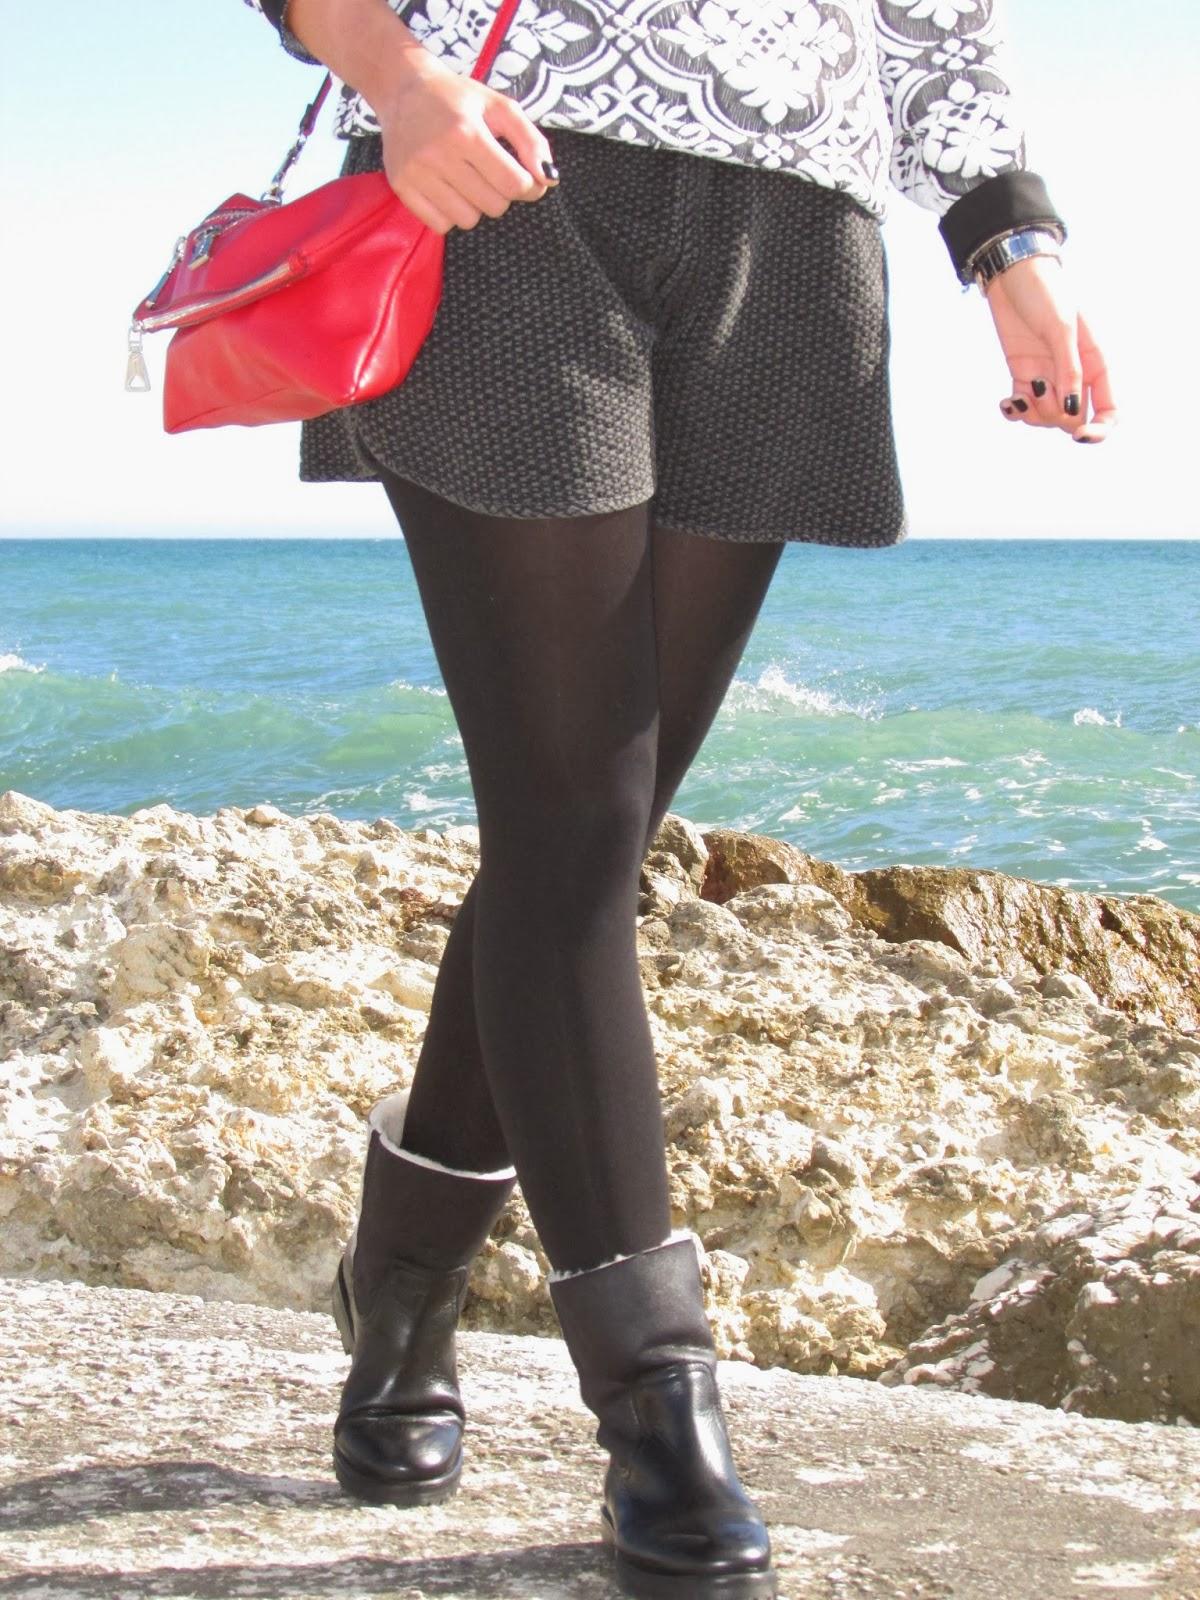 street style cristina style fashion fashion blogger ootd malaga malagueña spain outfit look casual chic tendencias moda mango zara suiteblanco